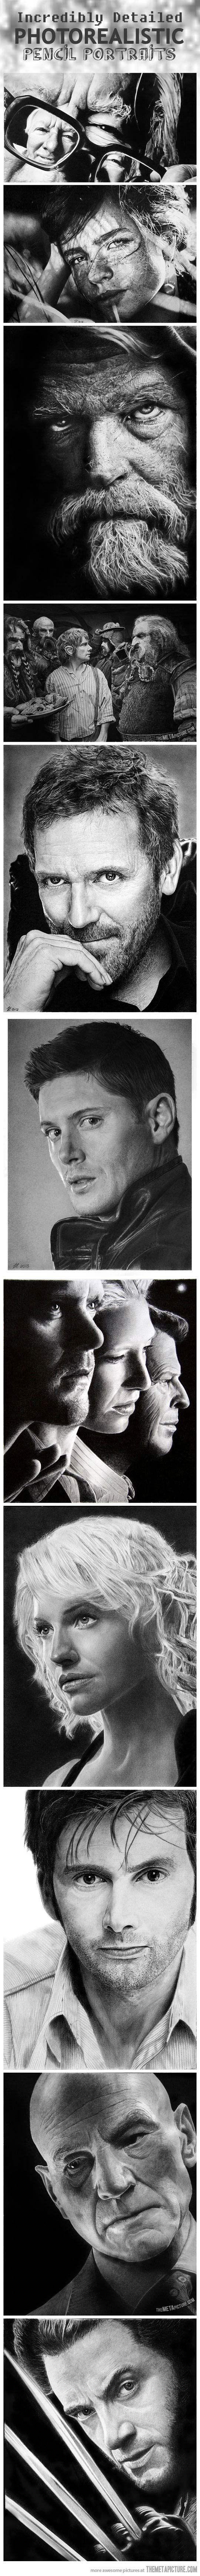 Cool photorealistic pencil portraits